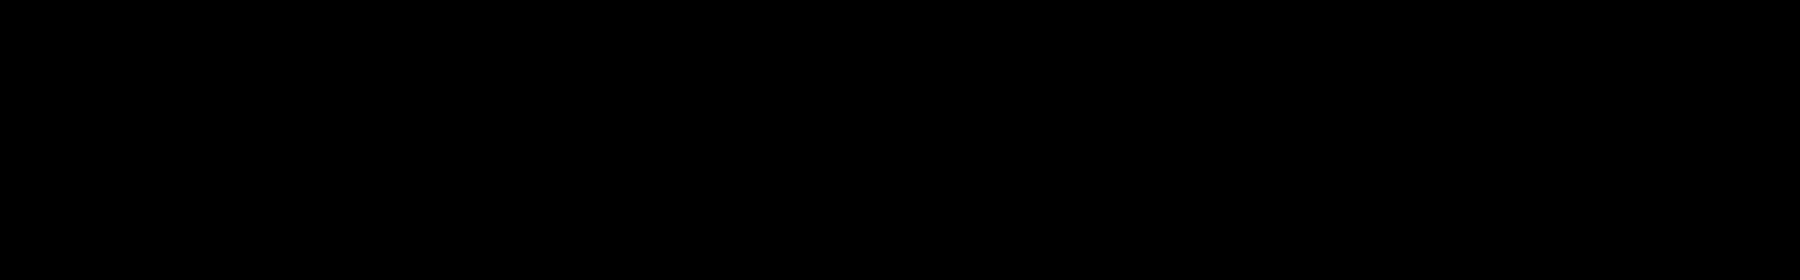 Eastern Trap audio waveform